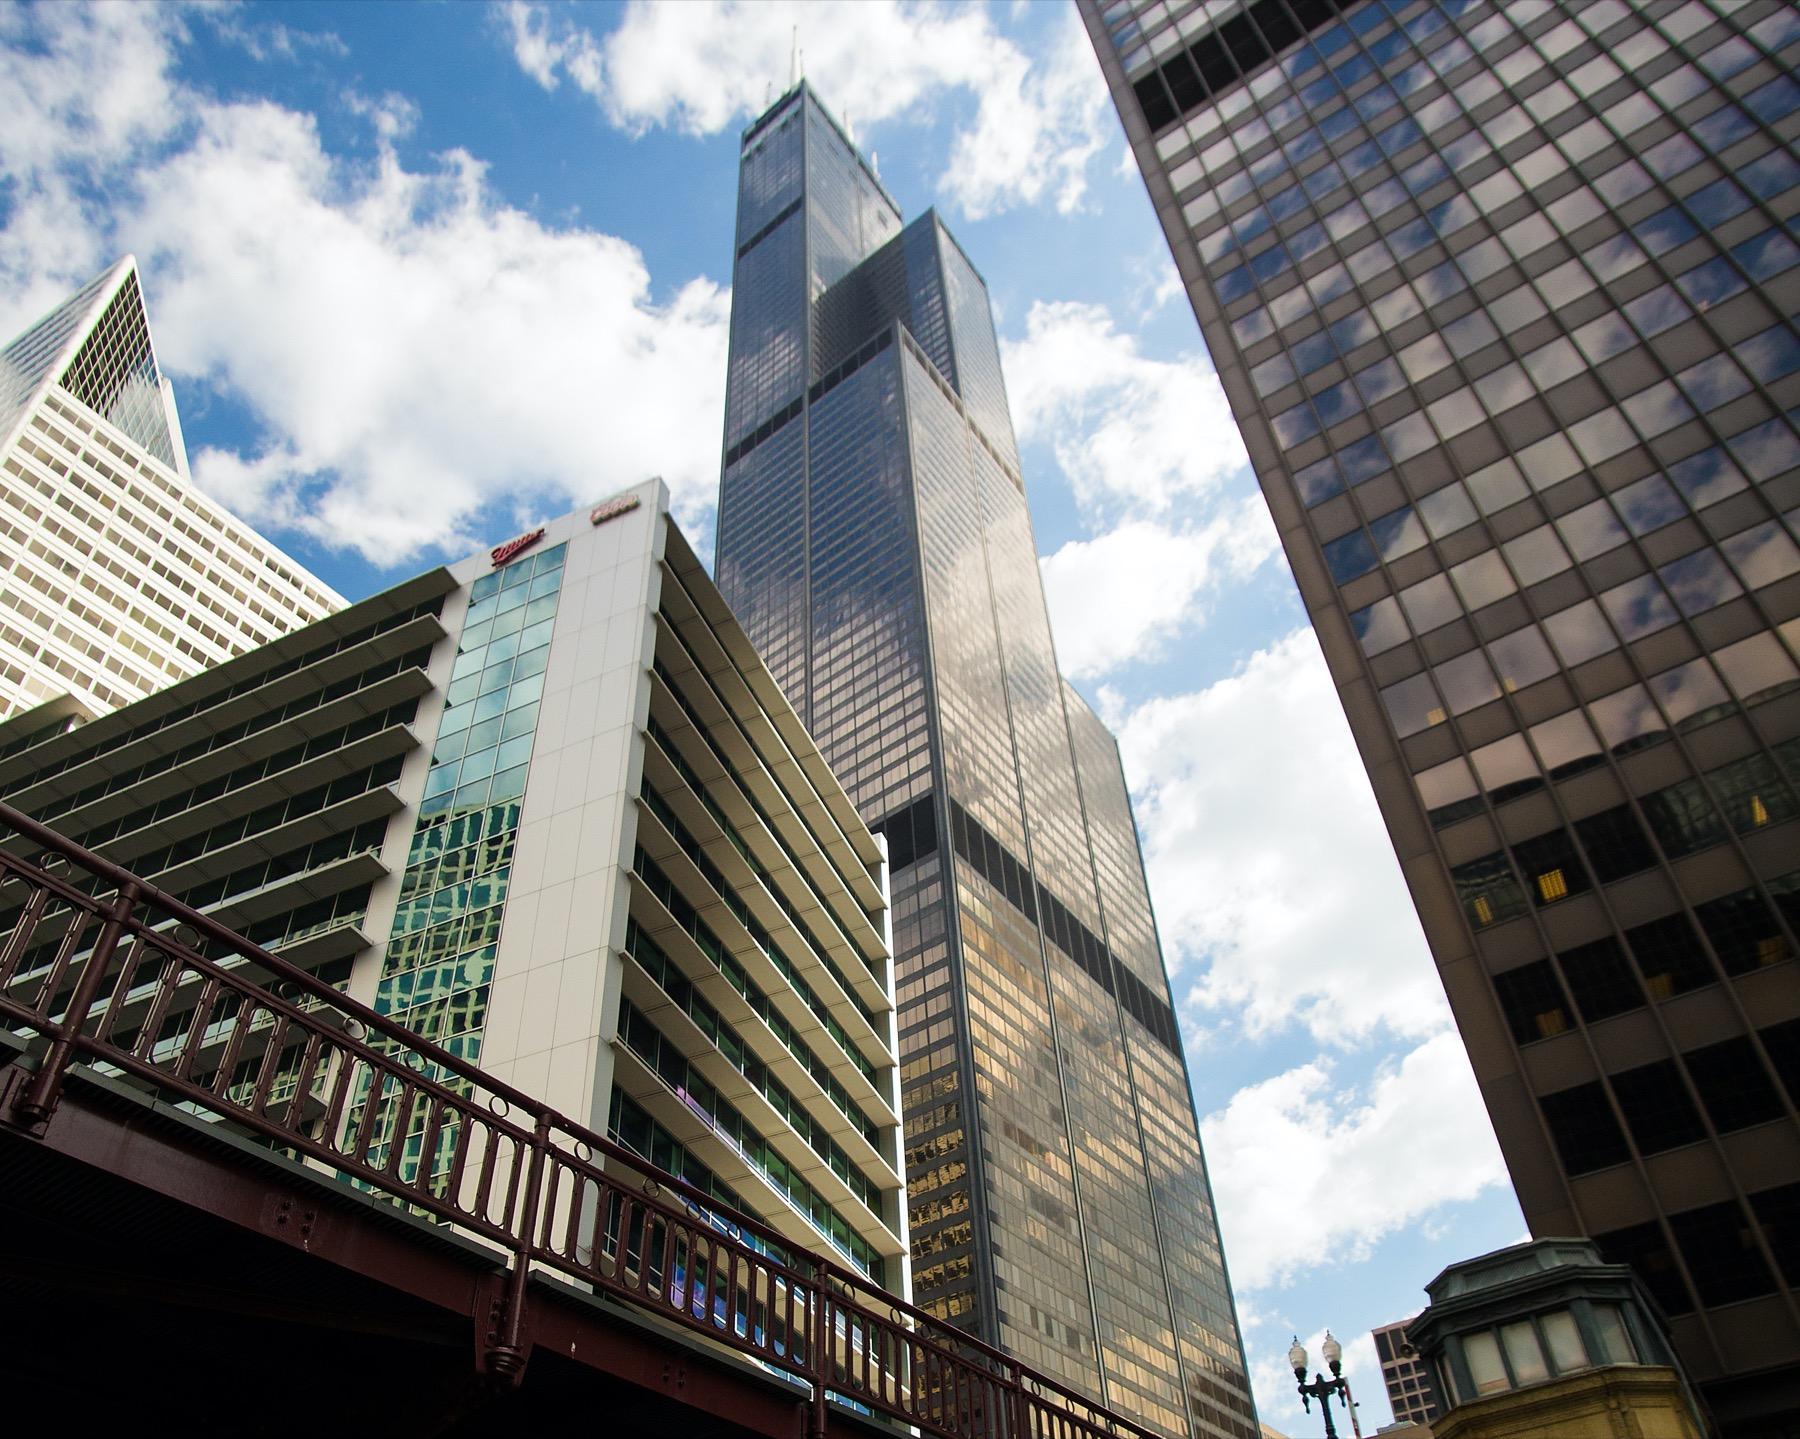 Willis Tower Chicago (aka Sears Tower)